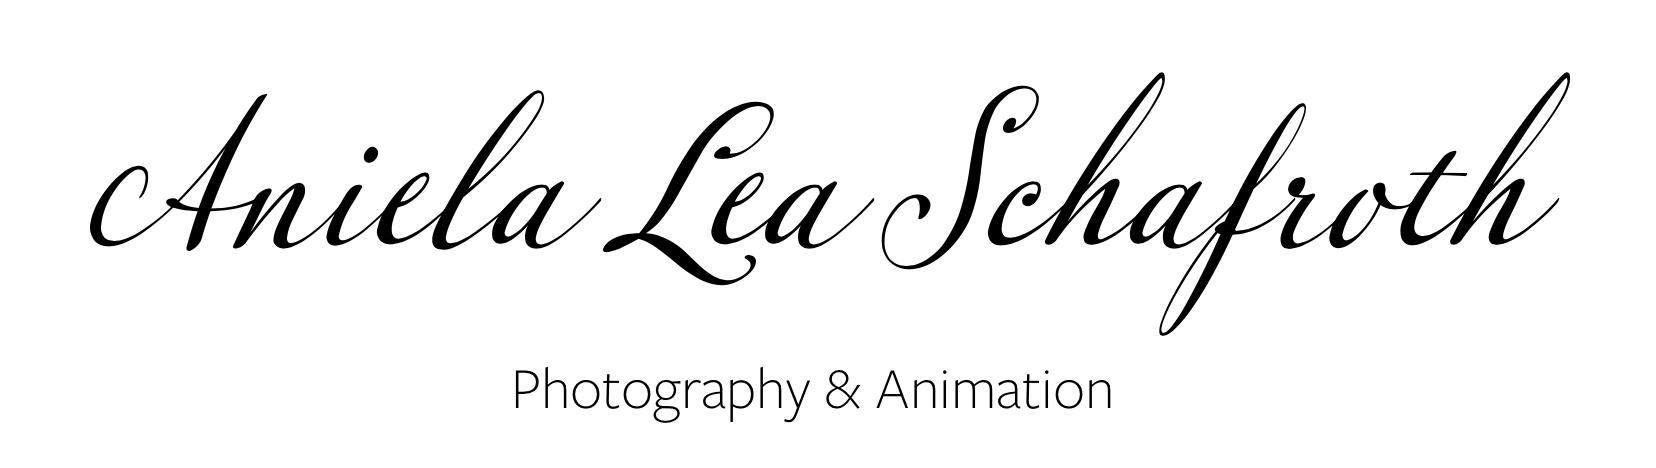 Aniela Lea Schafroth